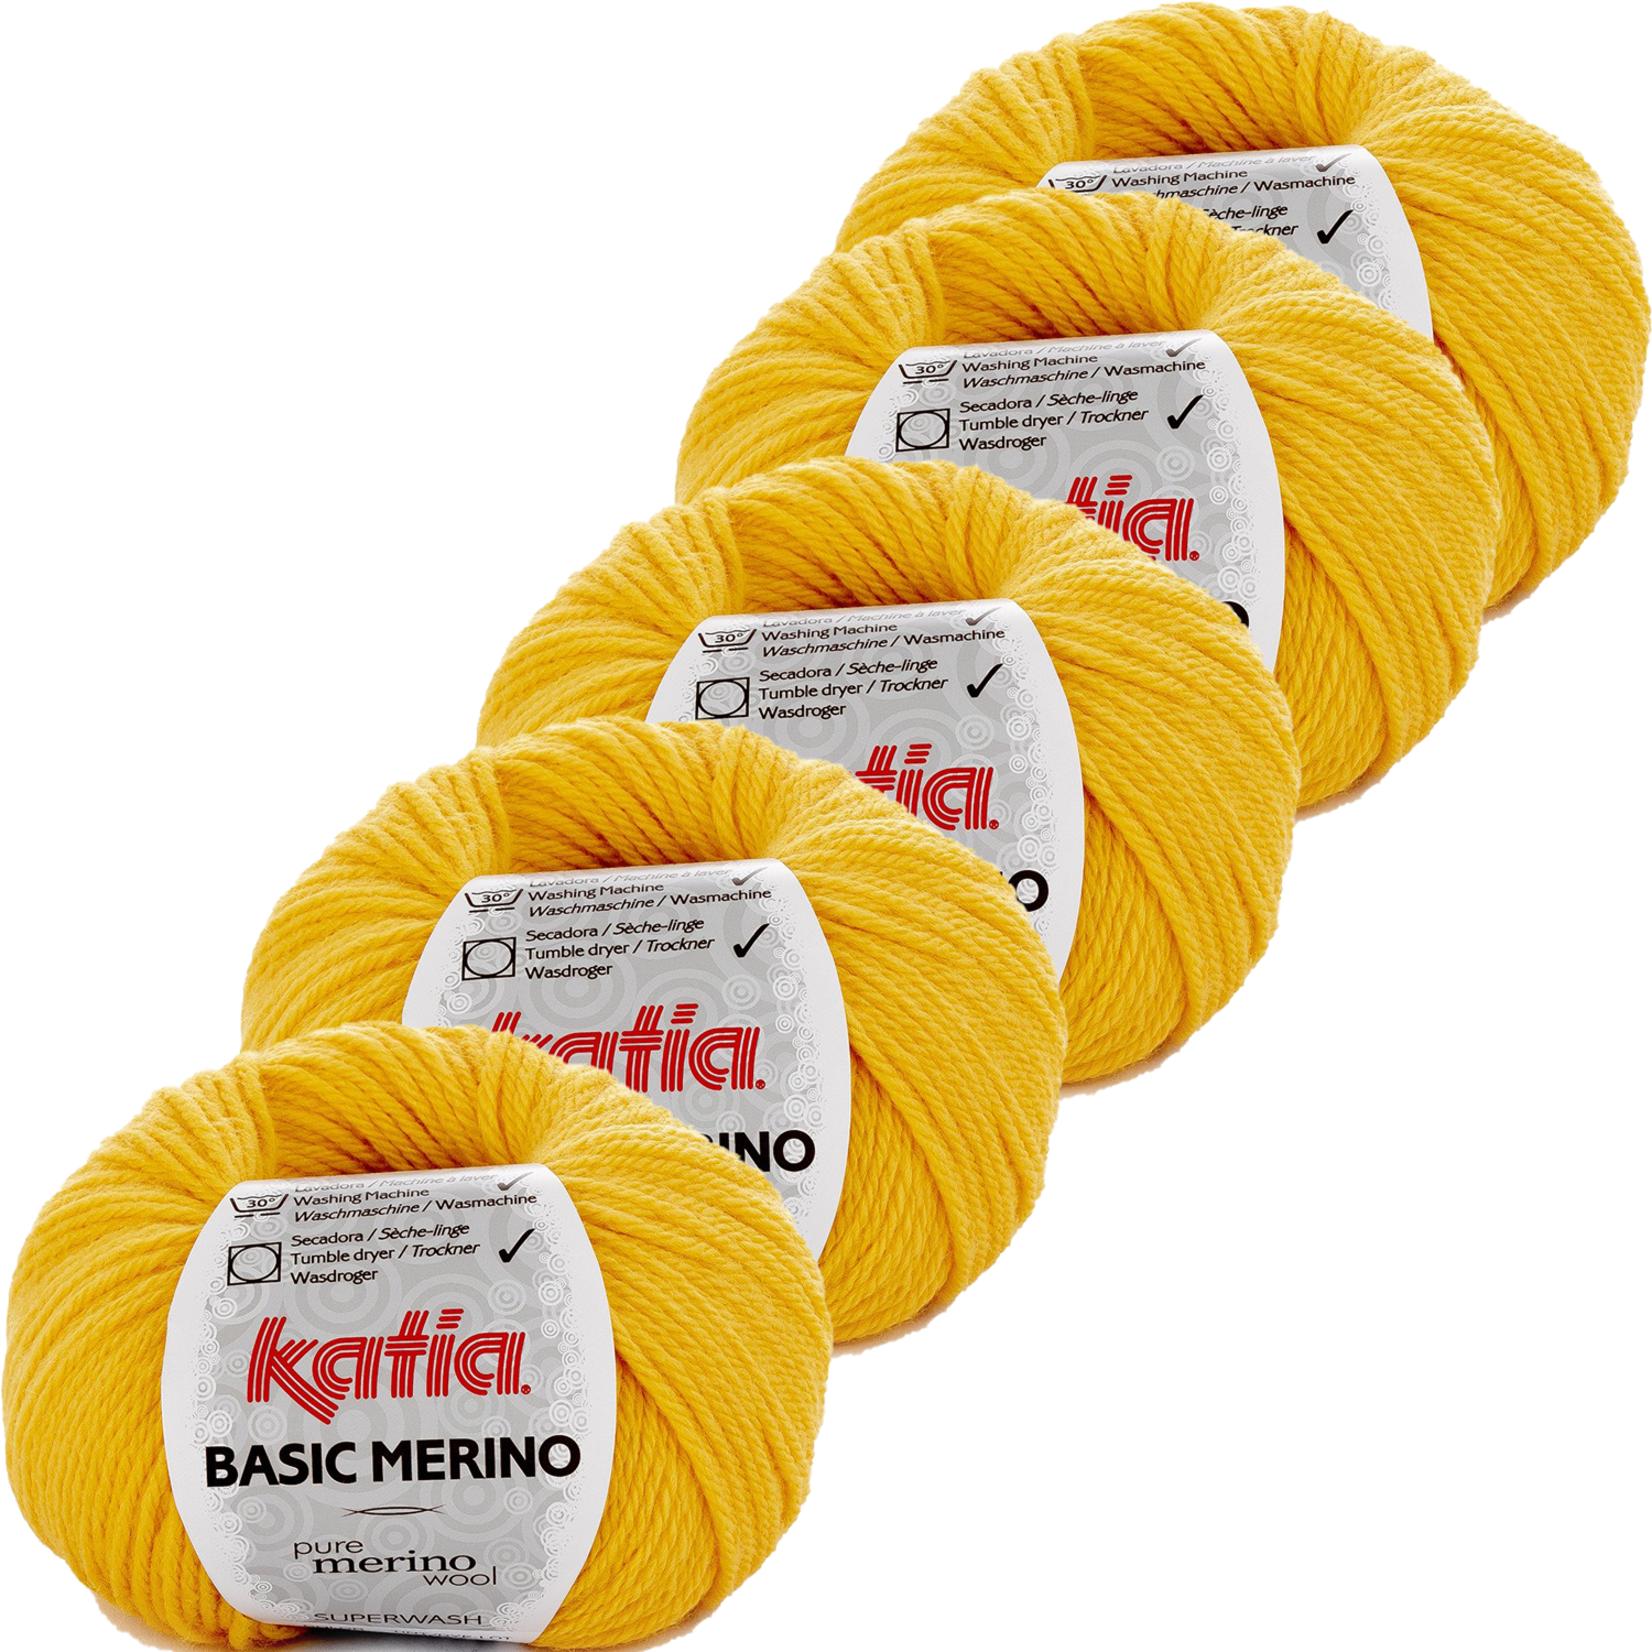 Katia Basic Merino - kleur 64_Geel - bundel 5 bollen 50 gr.  van 120 m.